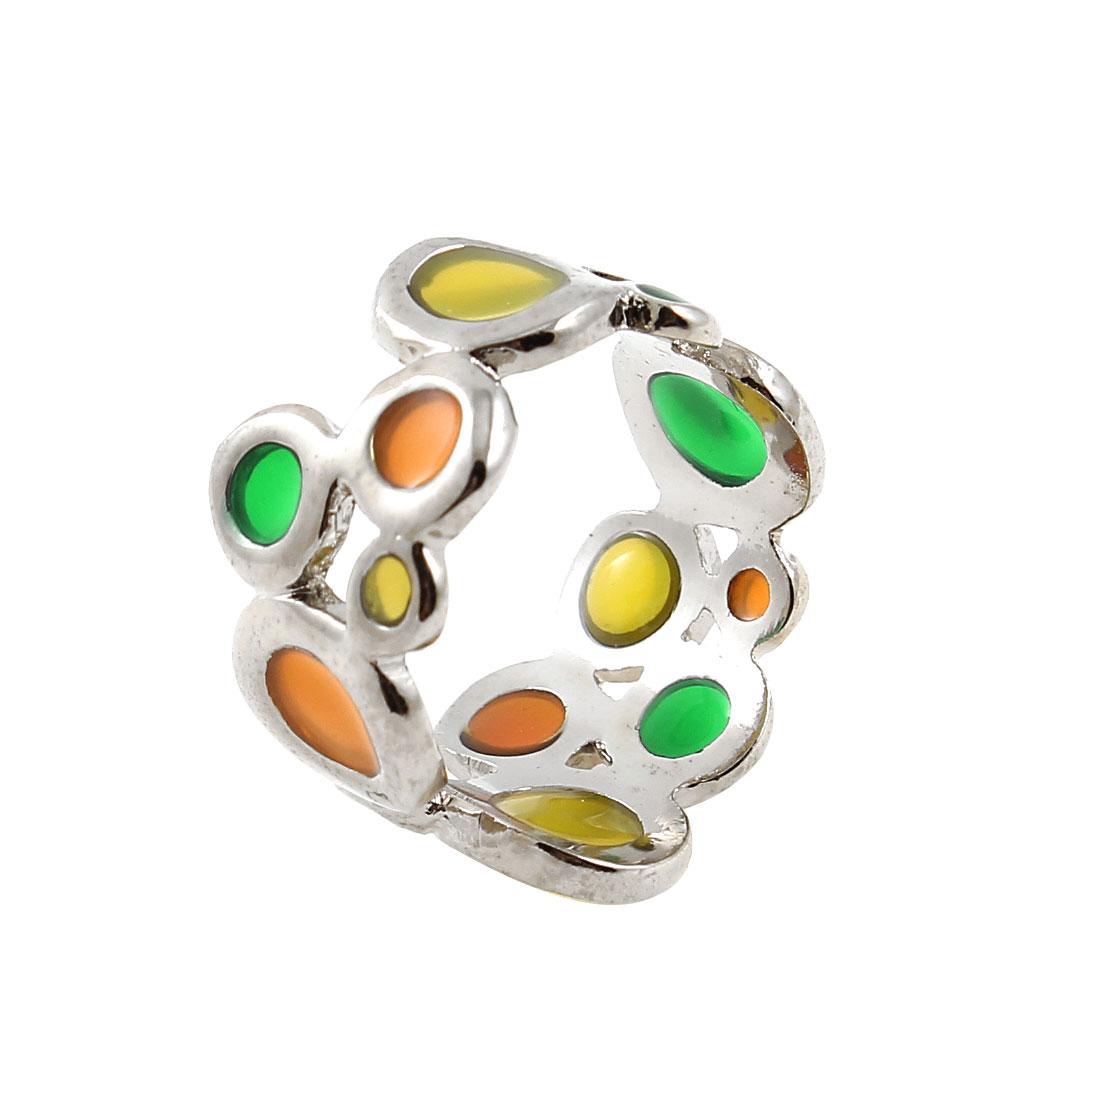 Fashion Circle Dots Detail Silver Tone Metal Finger Ring US 5 for Ladies